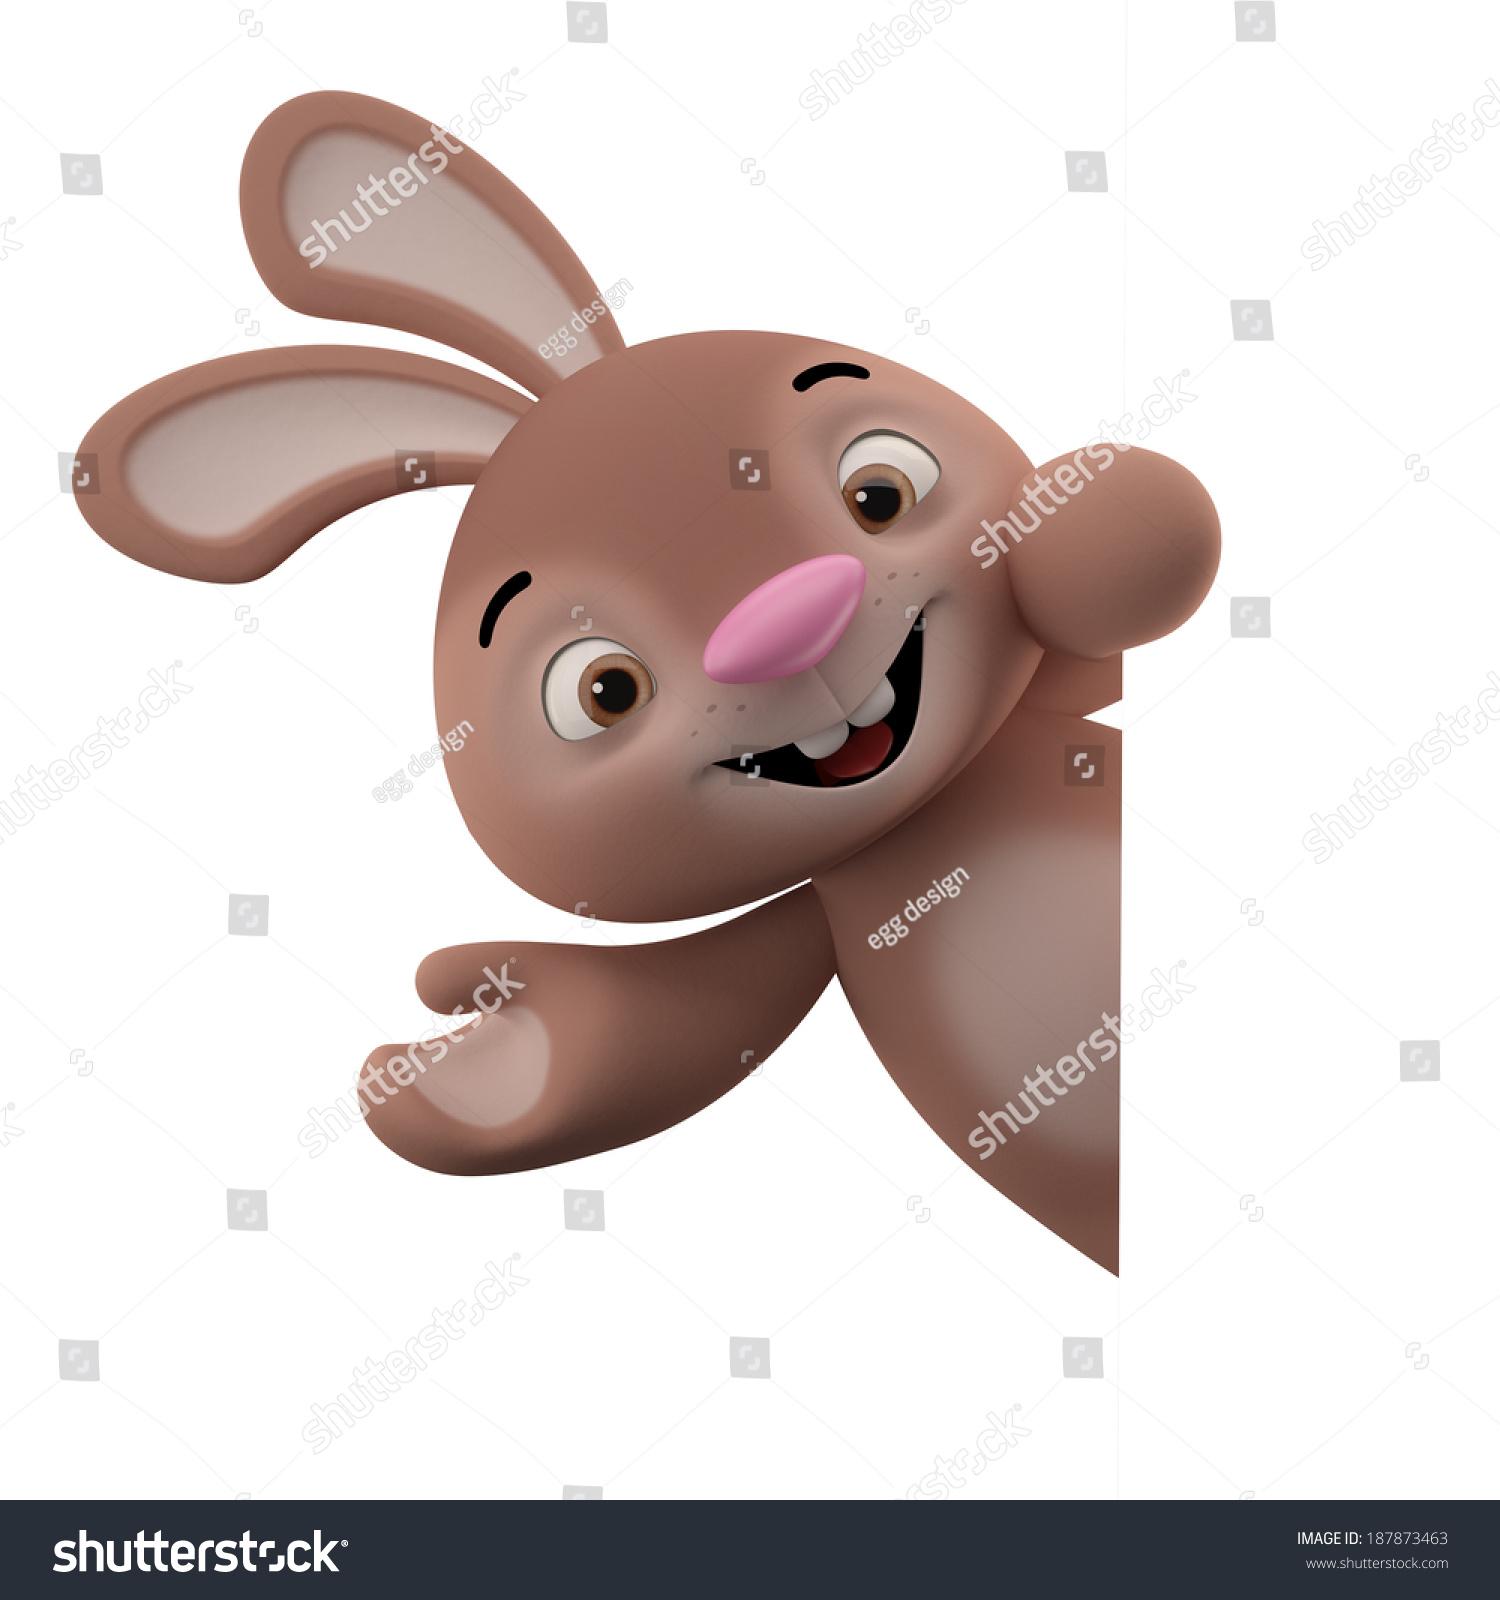 Amazing Cartoon: Amazing 3d Easter Bunny Merry Cartoon Stock Illustration